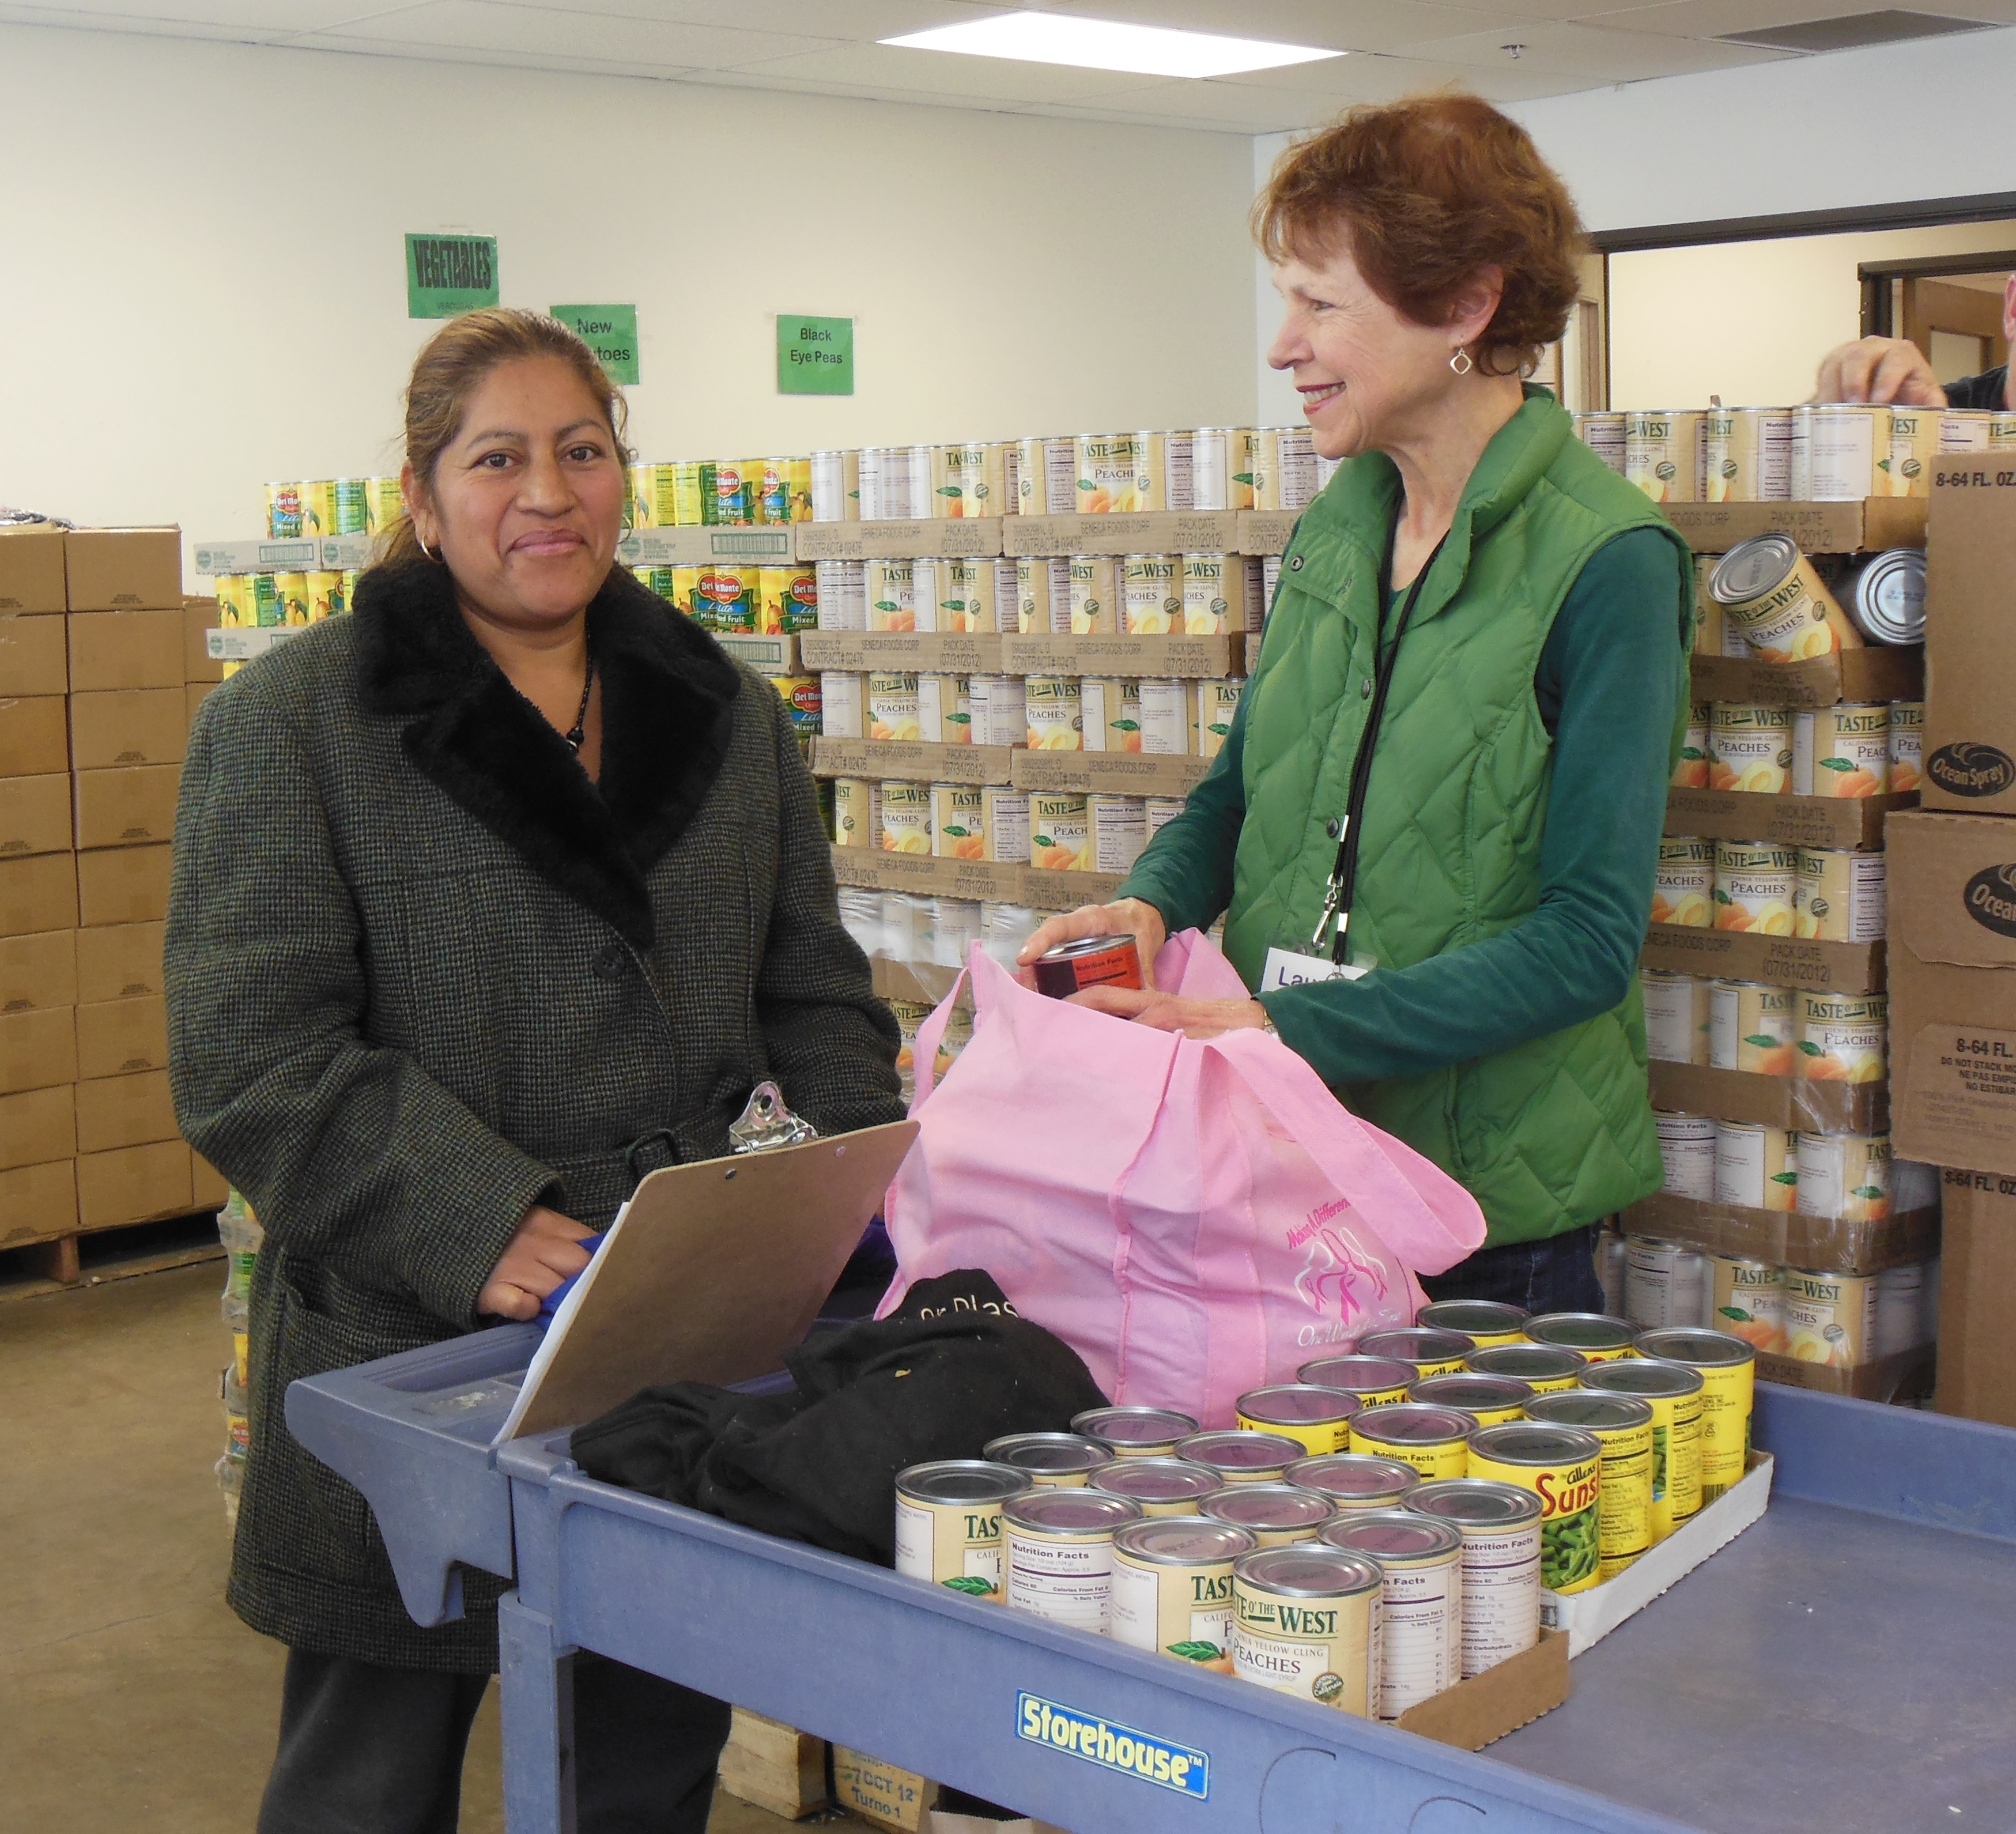 Community Service Organization - Crossroads Community Services Youth Volunteers  4